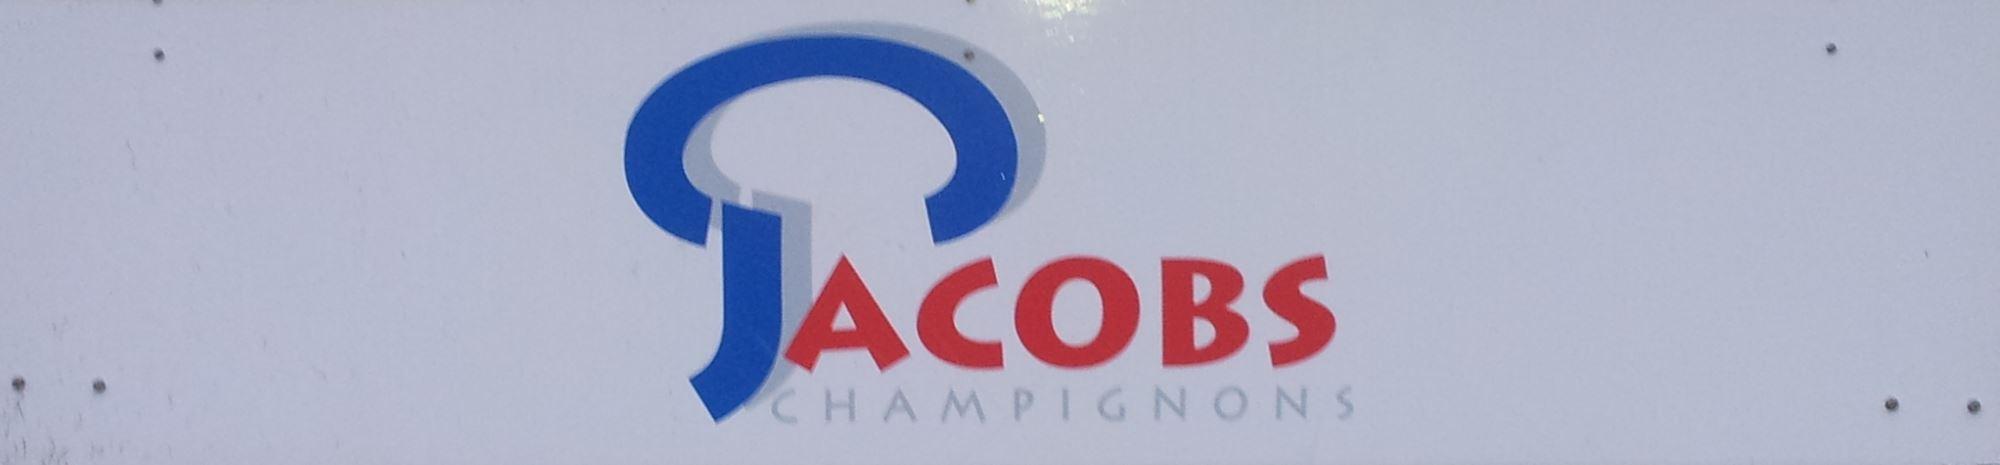 bord_Jacobs